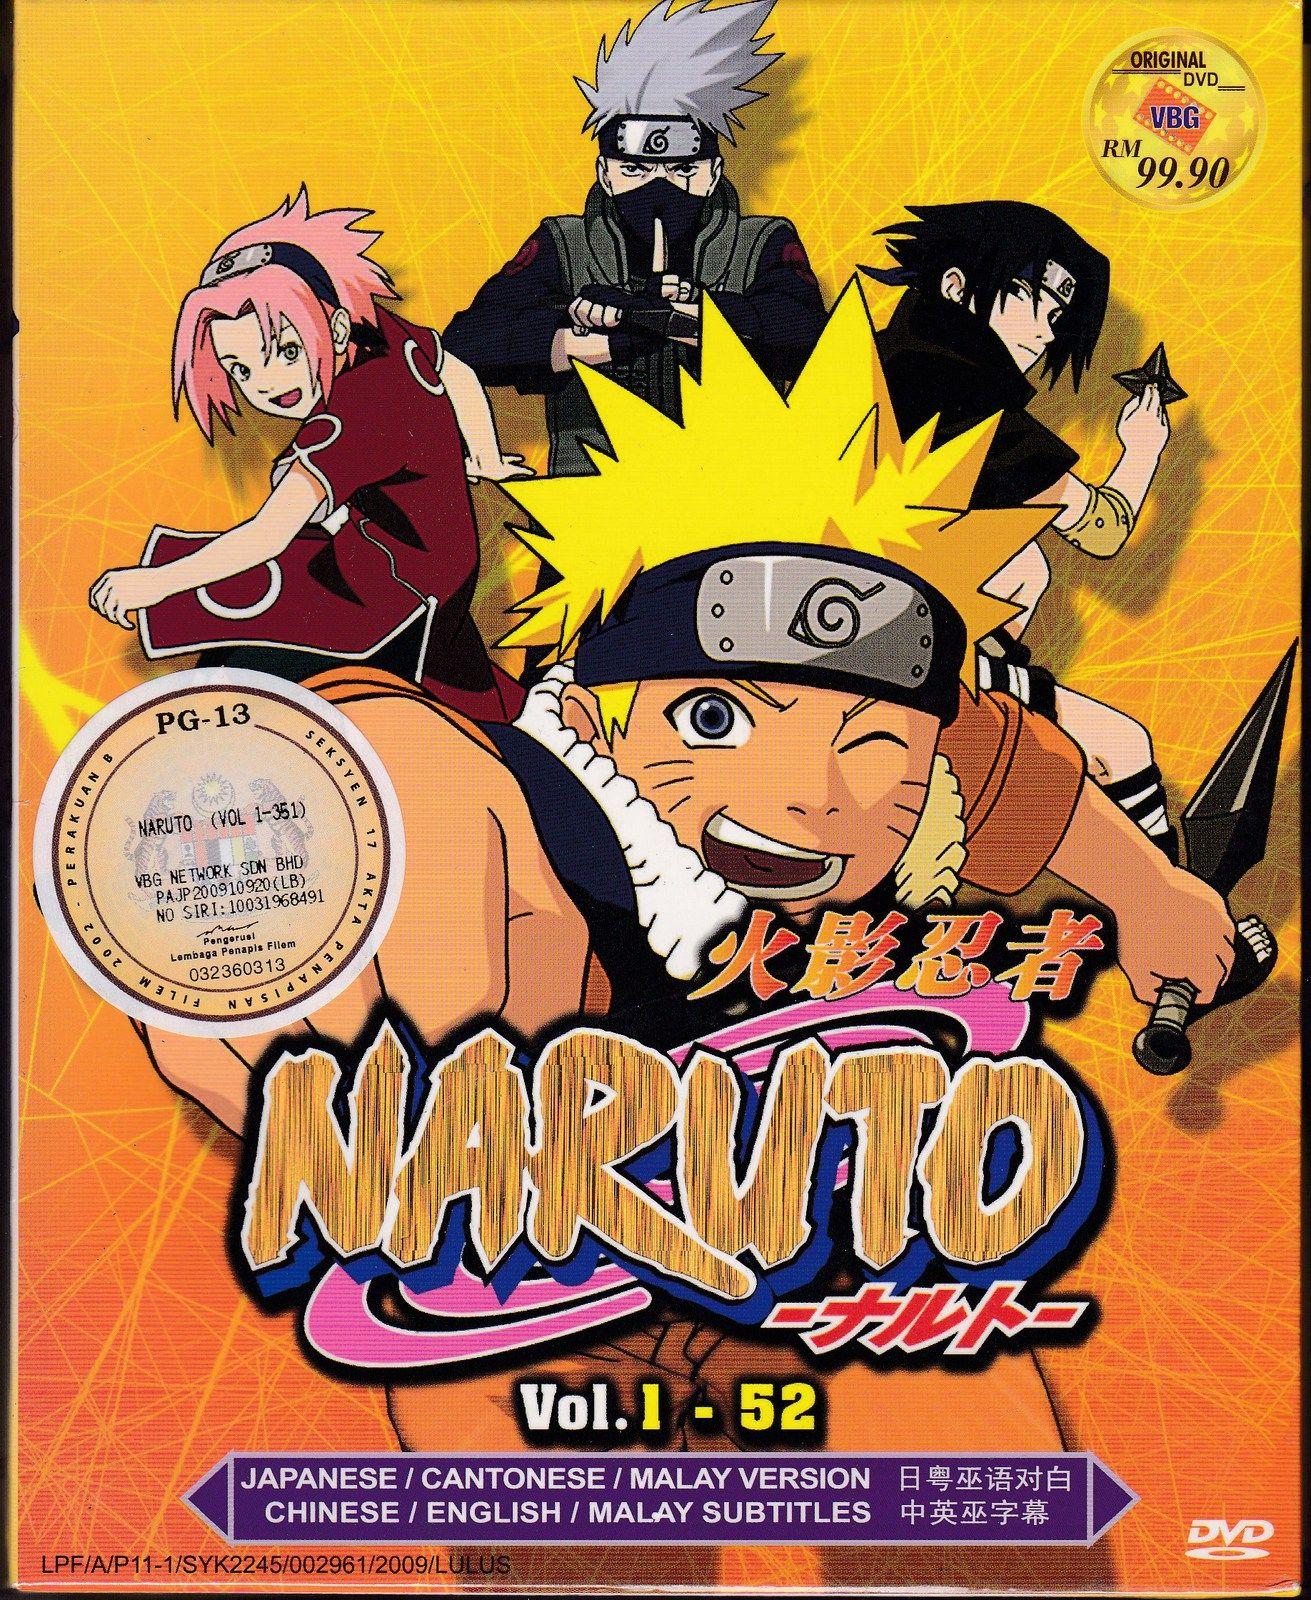 Dvd anime naruto season 12 vol152 box set 52 episode